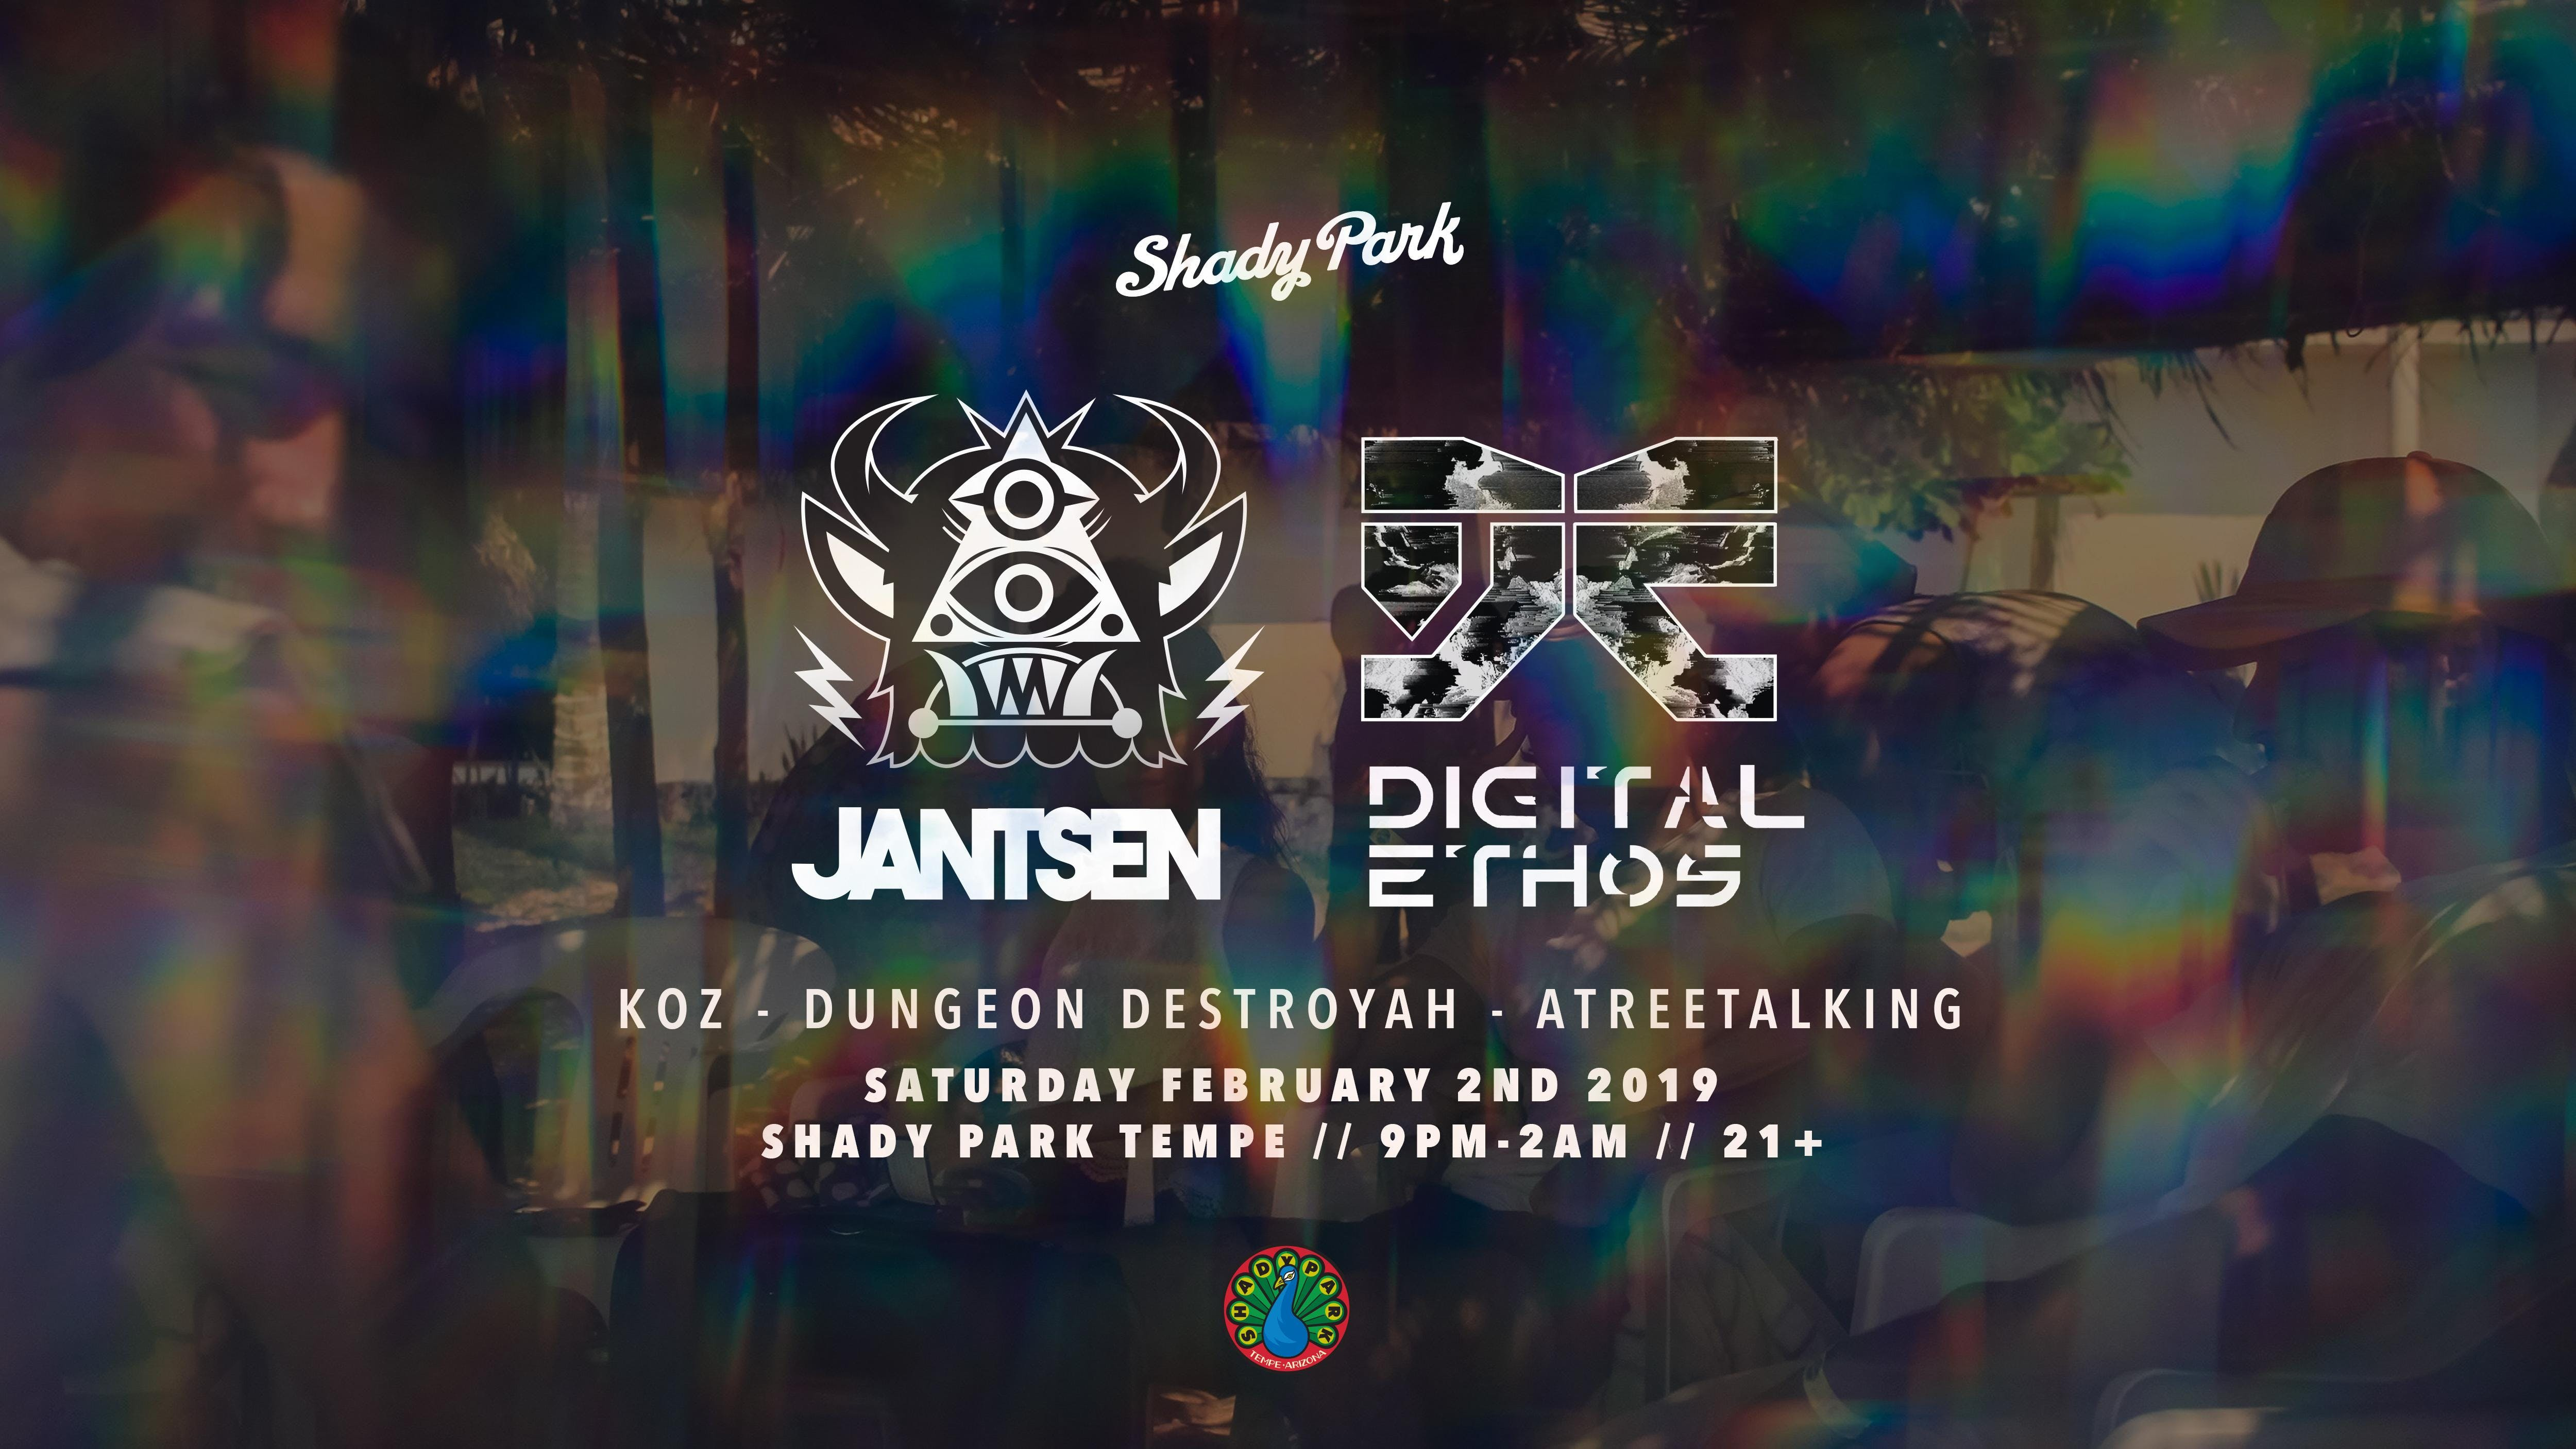 Jantsen + Digital Ethos at Shady Park